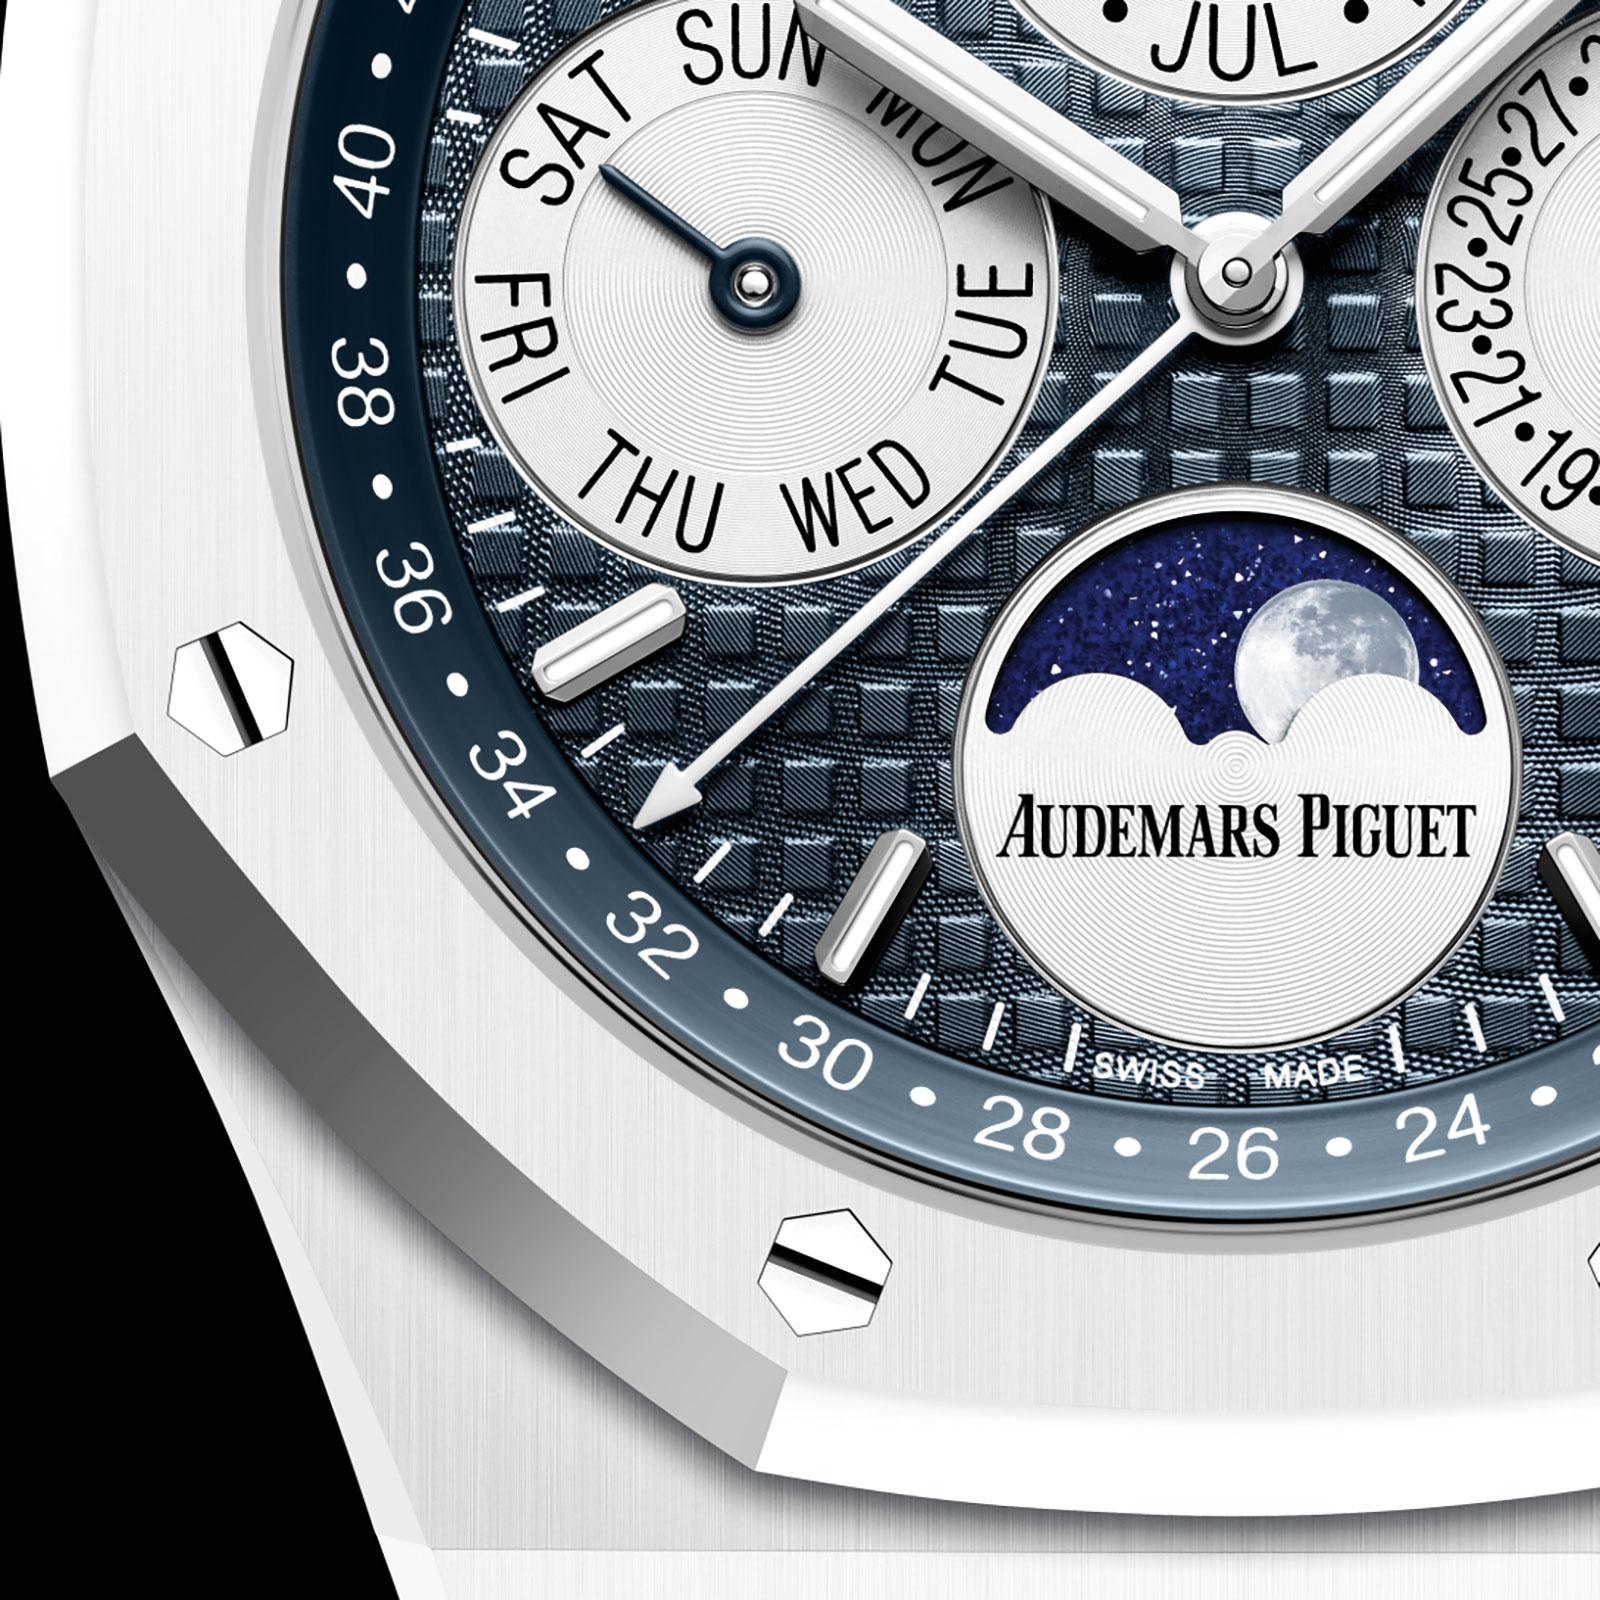 audemars-piguet-Royal-Oak-Perpetual-Calendar-white-ceramic-1.jpg